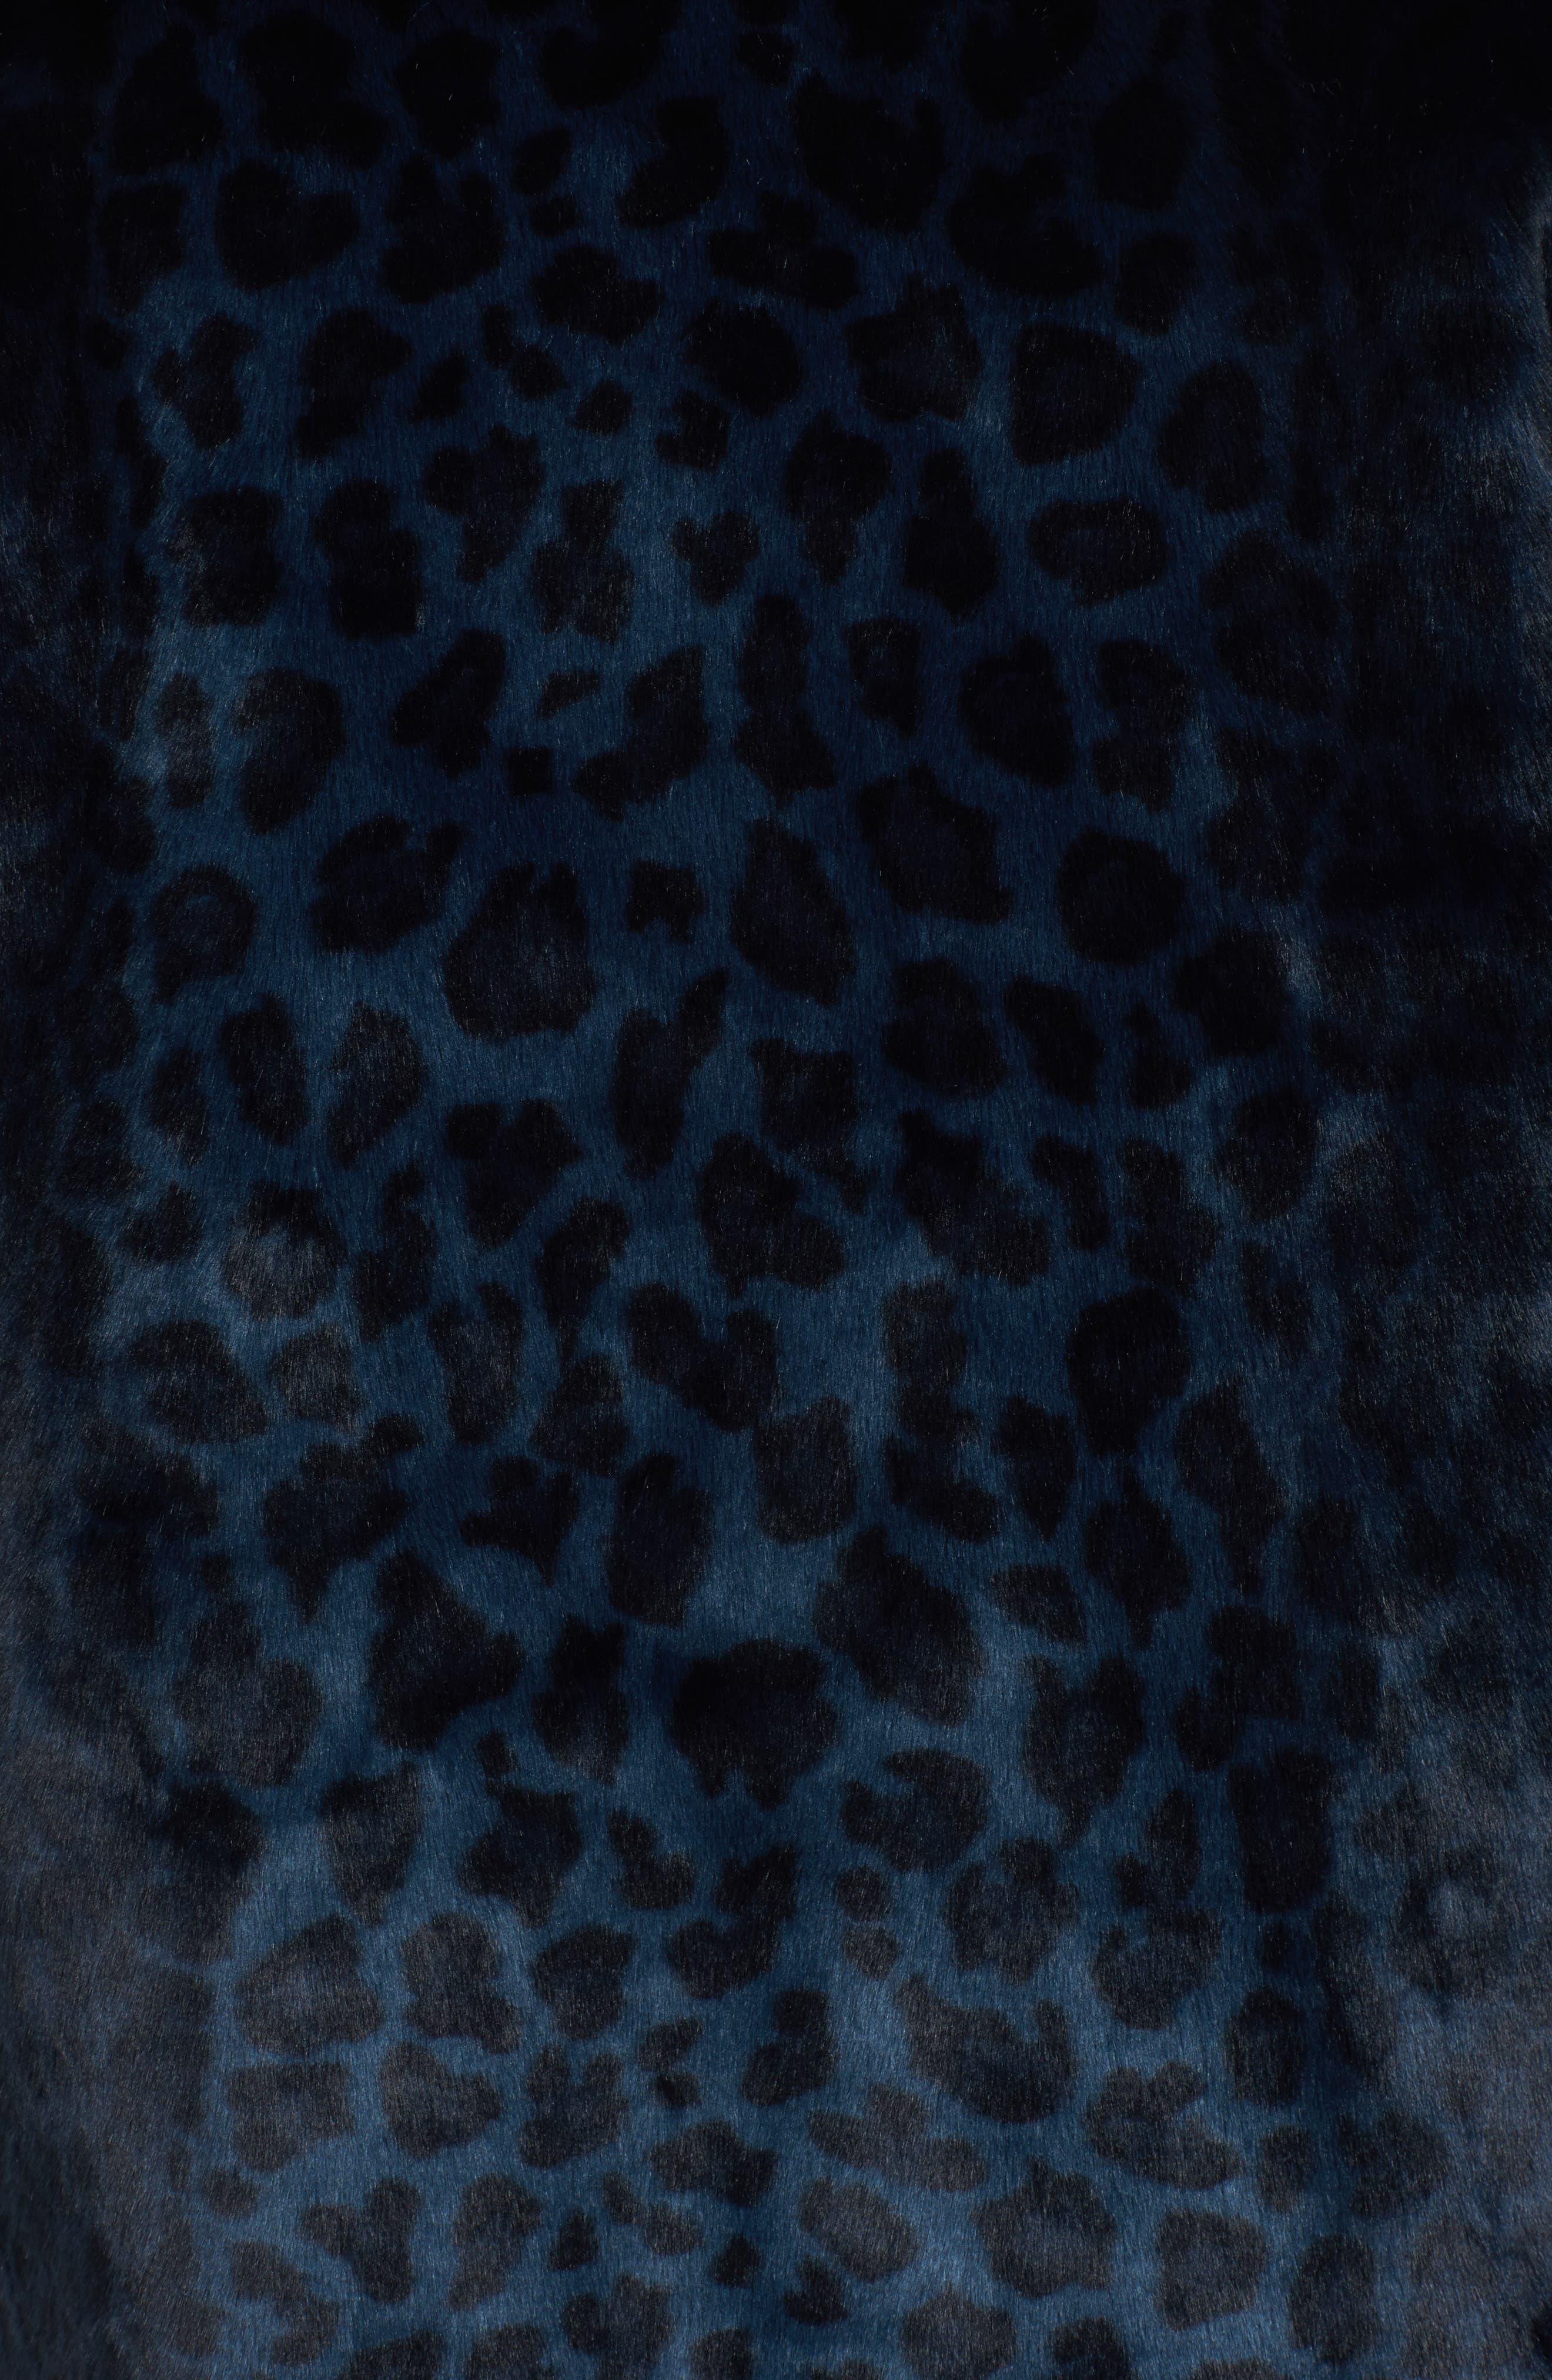 Reversible Cheetah Print Faux Fur Jacket,                             Alternate thumbnail 5, color,                             Navy